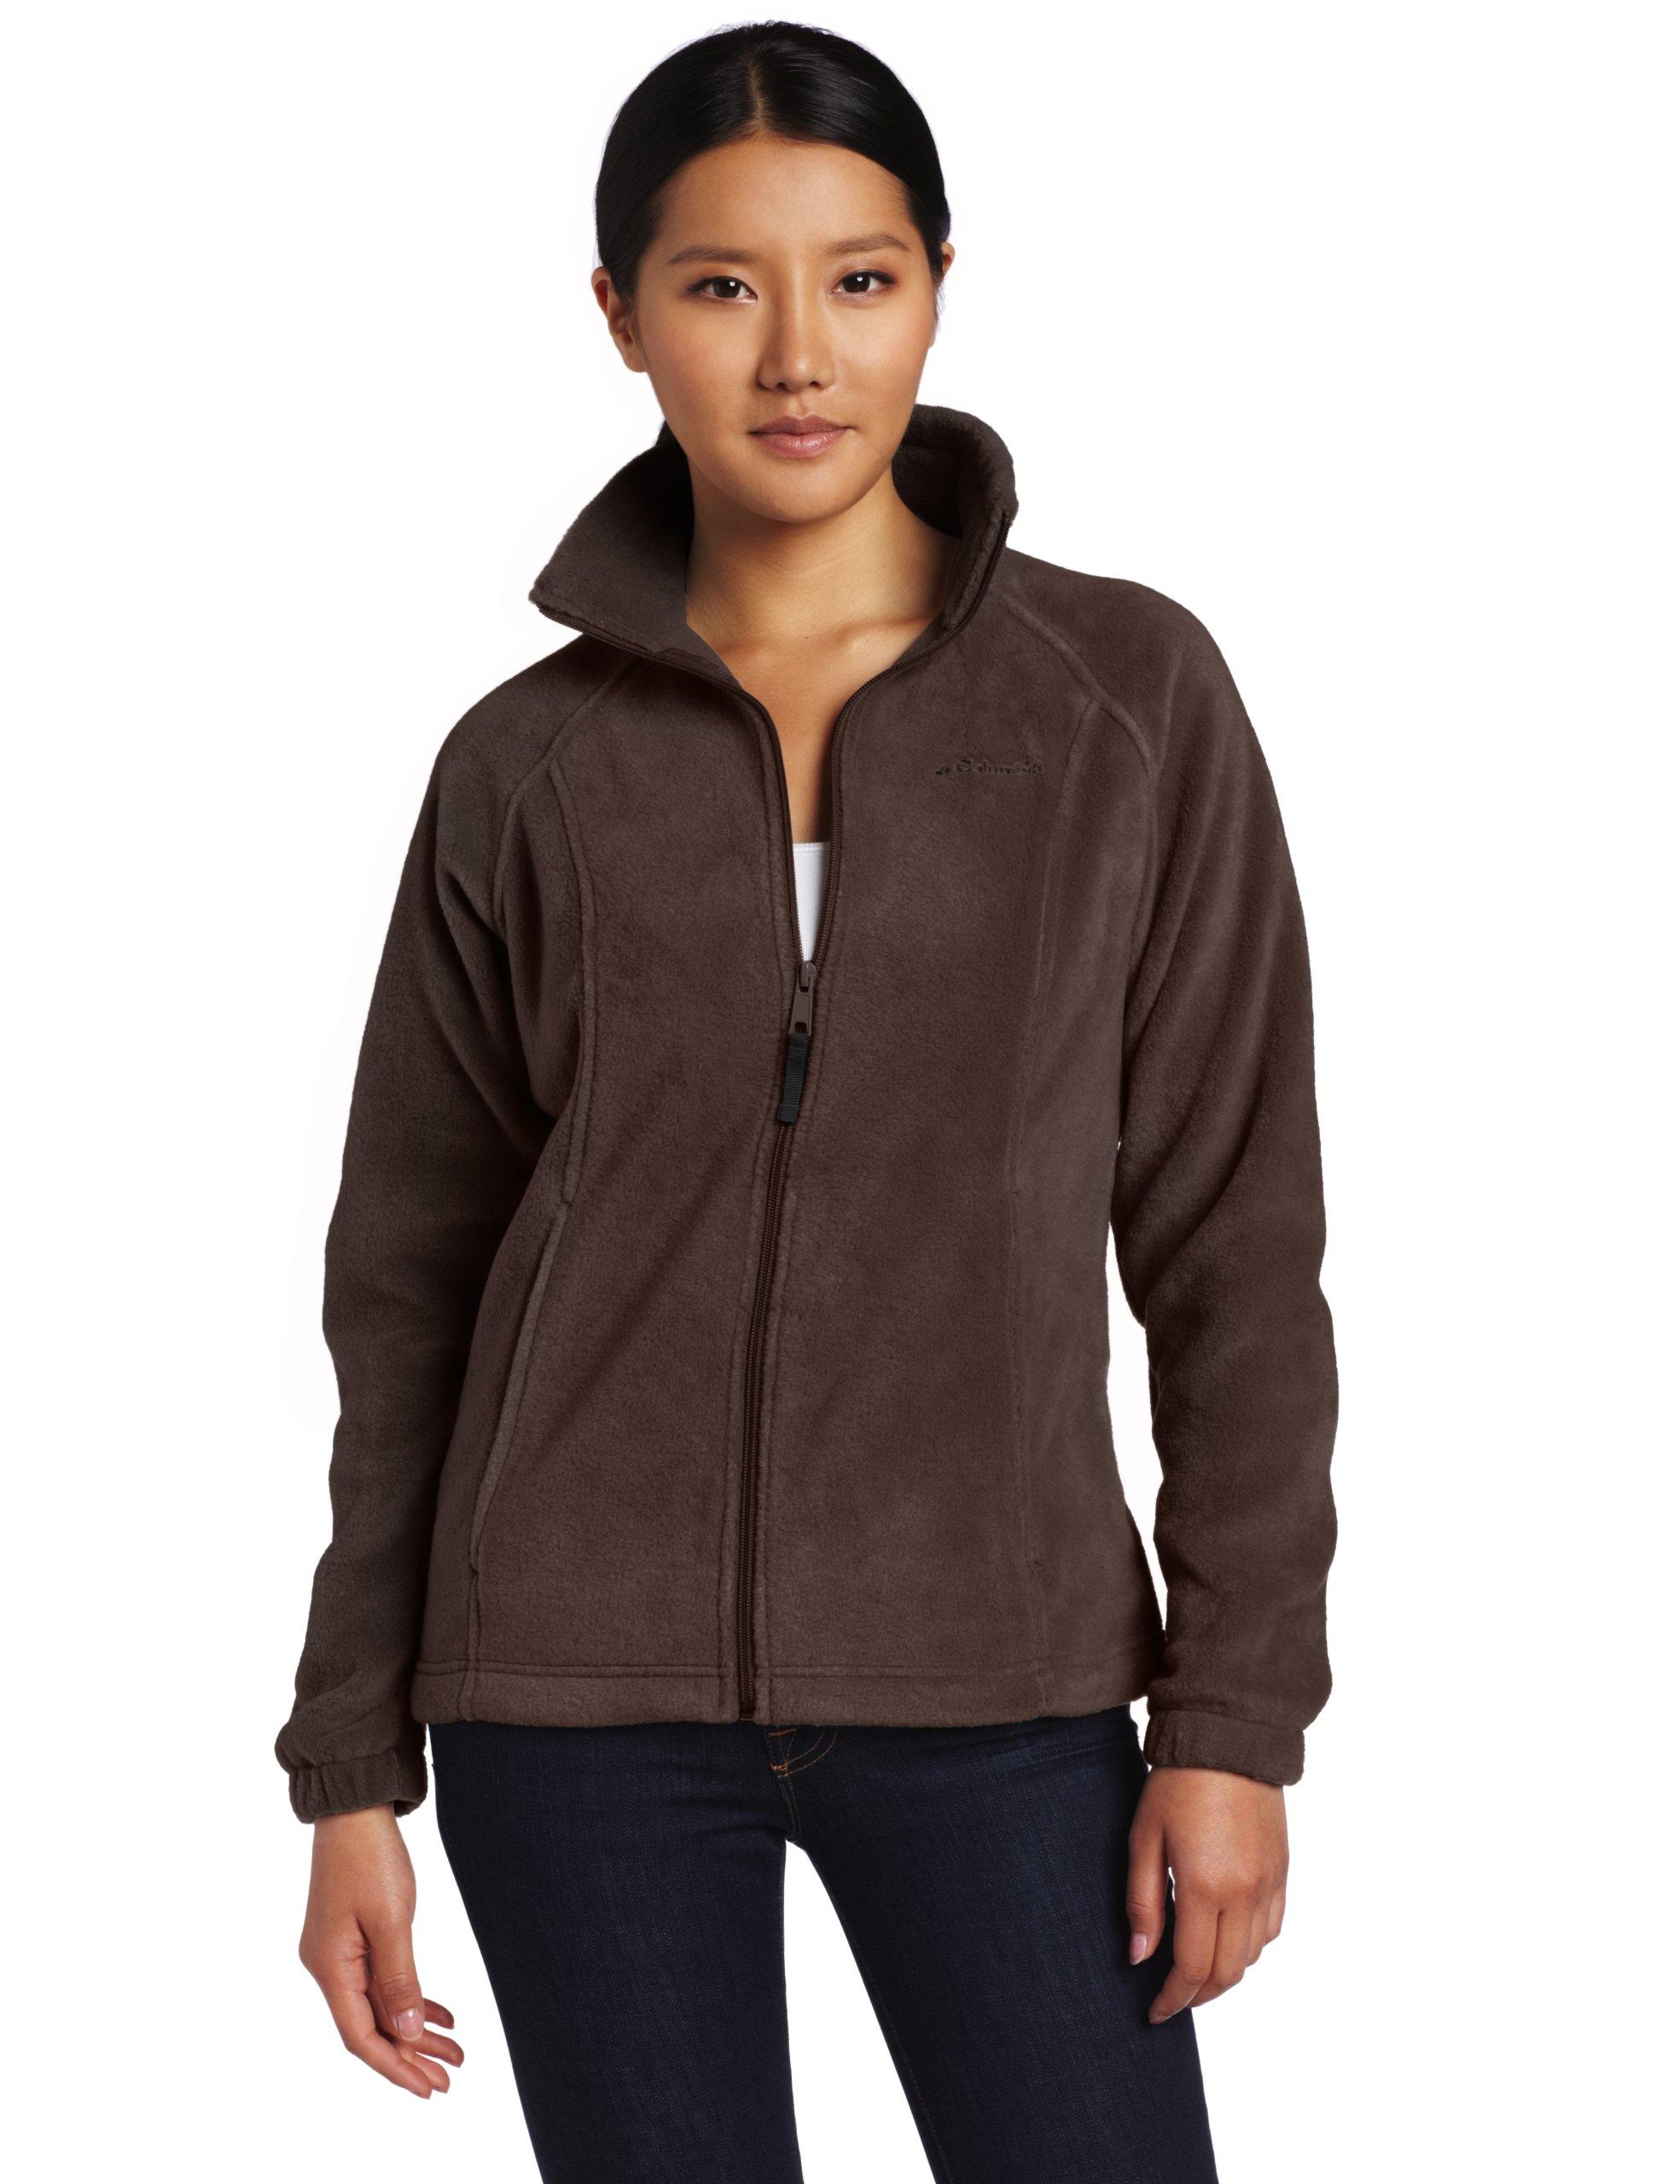 Columbia Women's Benton Springs Classic Fit Full Zip Soft Fleece Jacket, Bark, X-Large